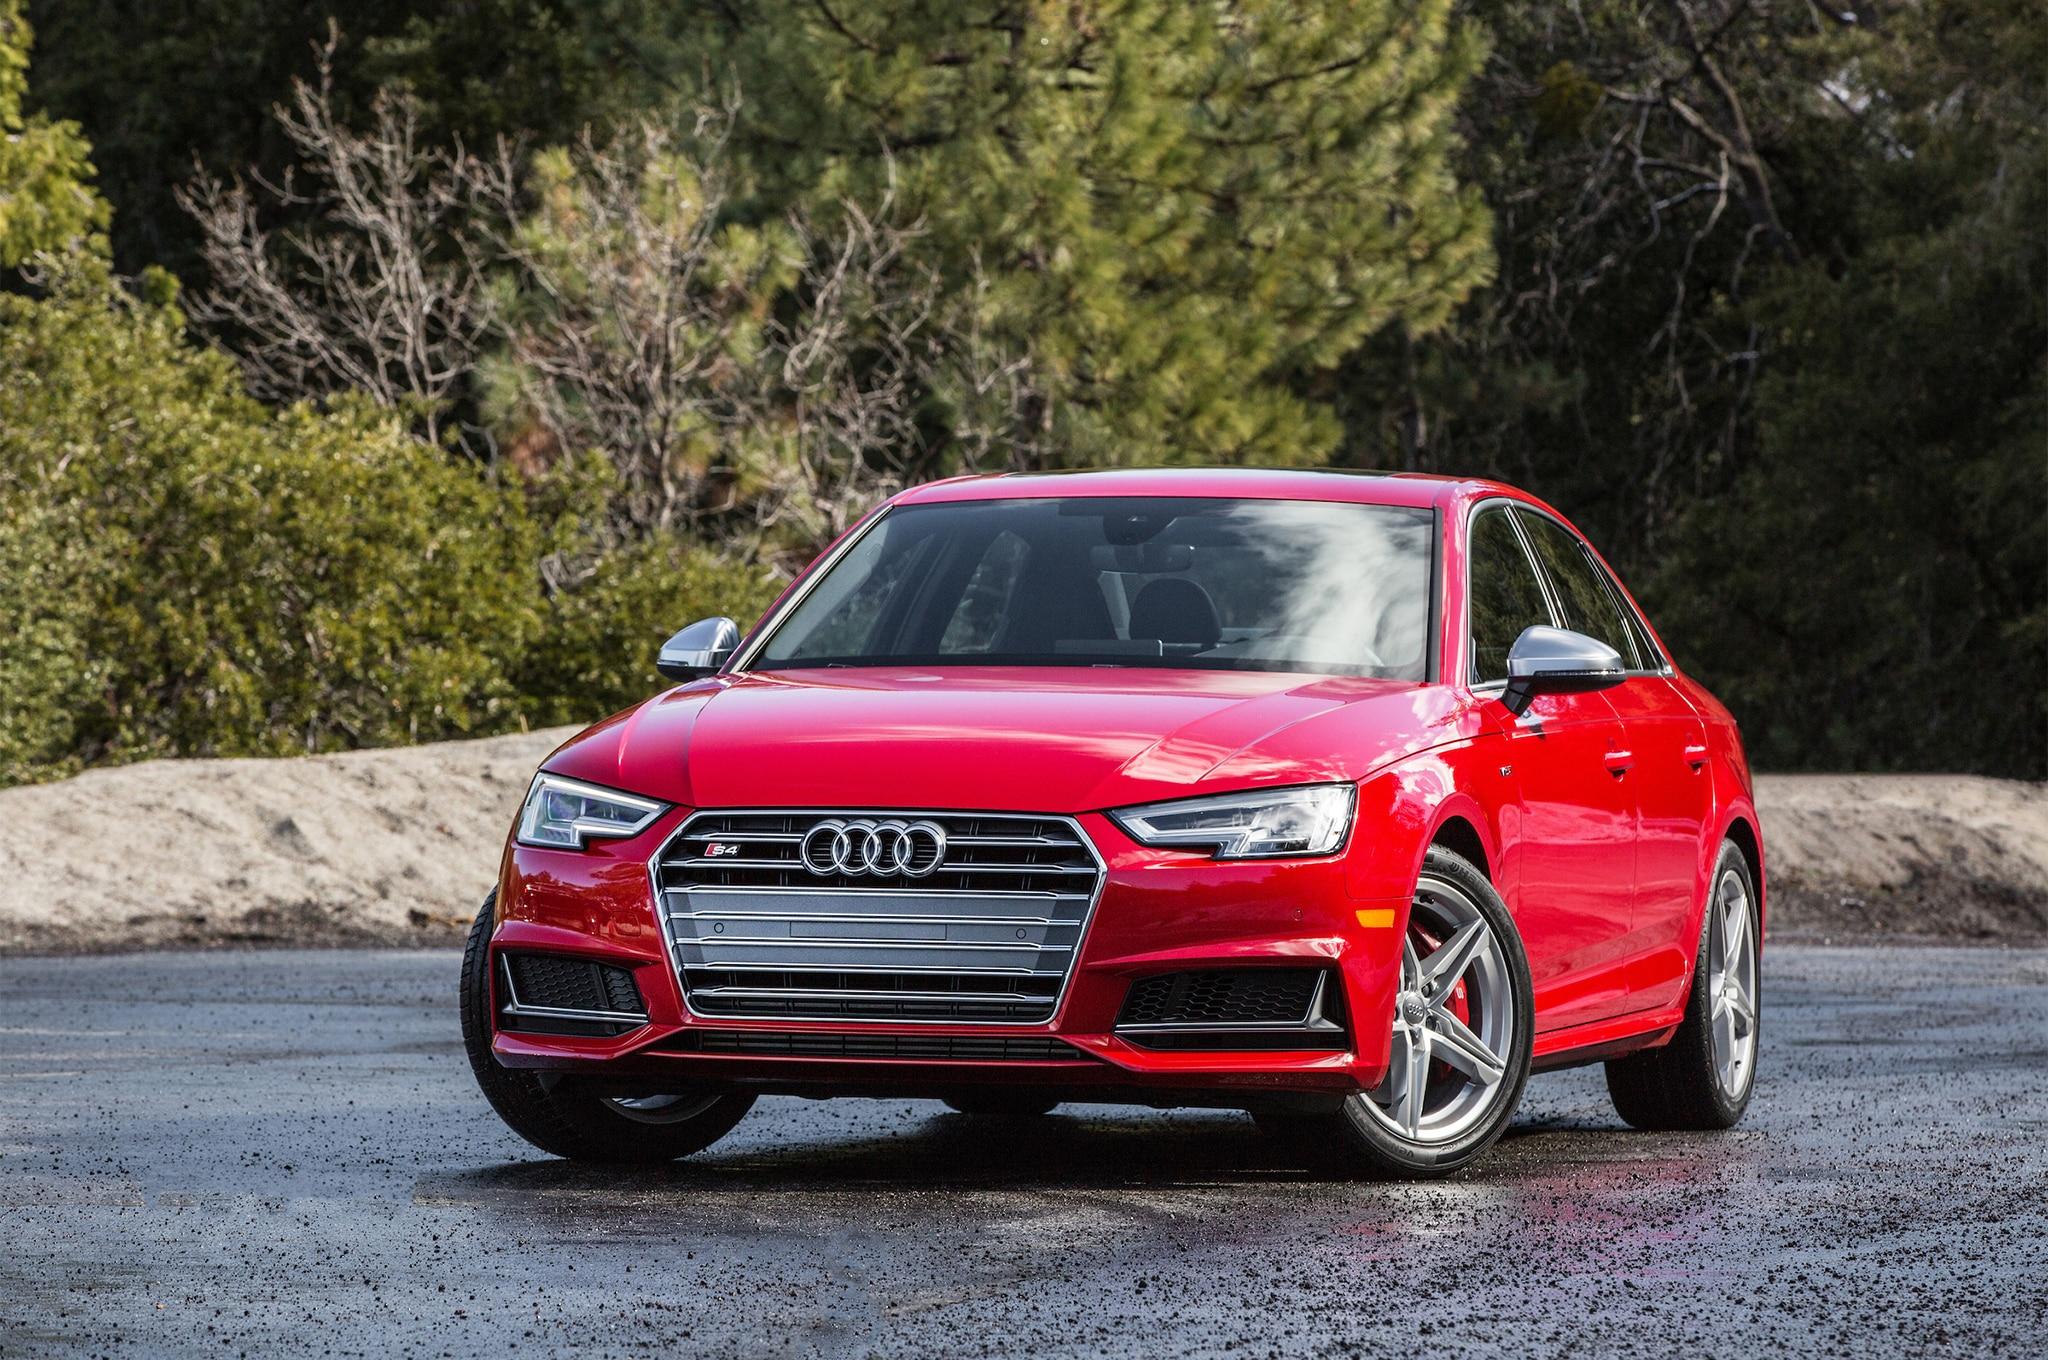 Audi S4 0 60 >> First Drive: 2018 Audi S4 | Automobile Magazine